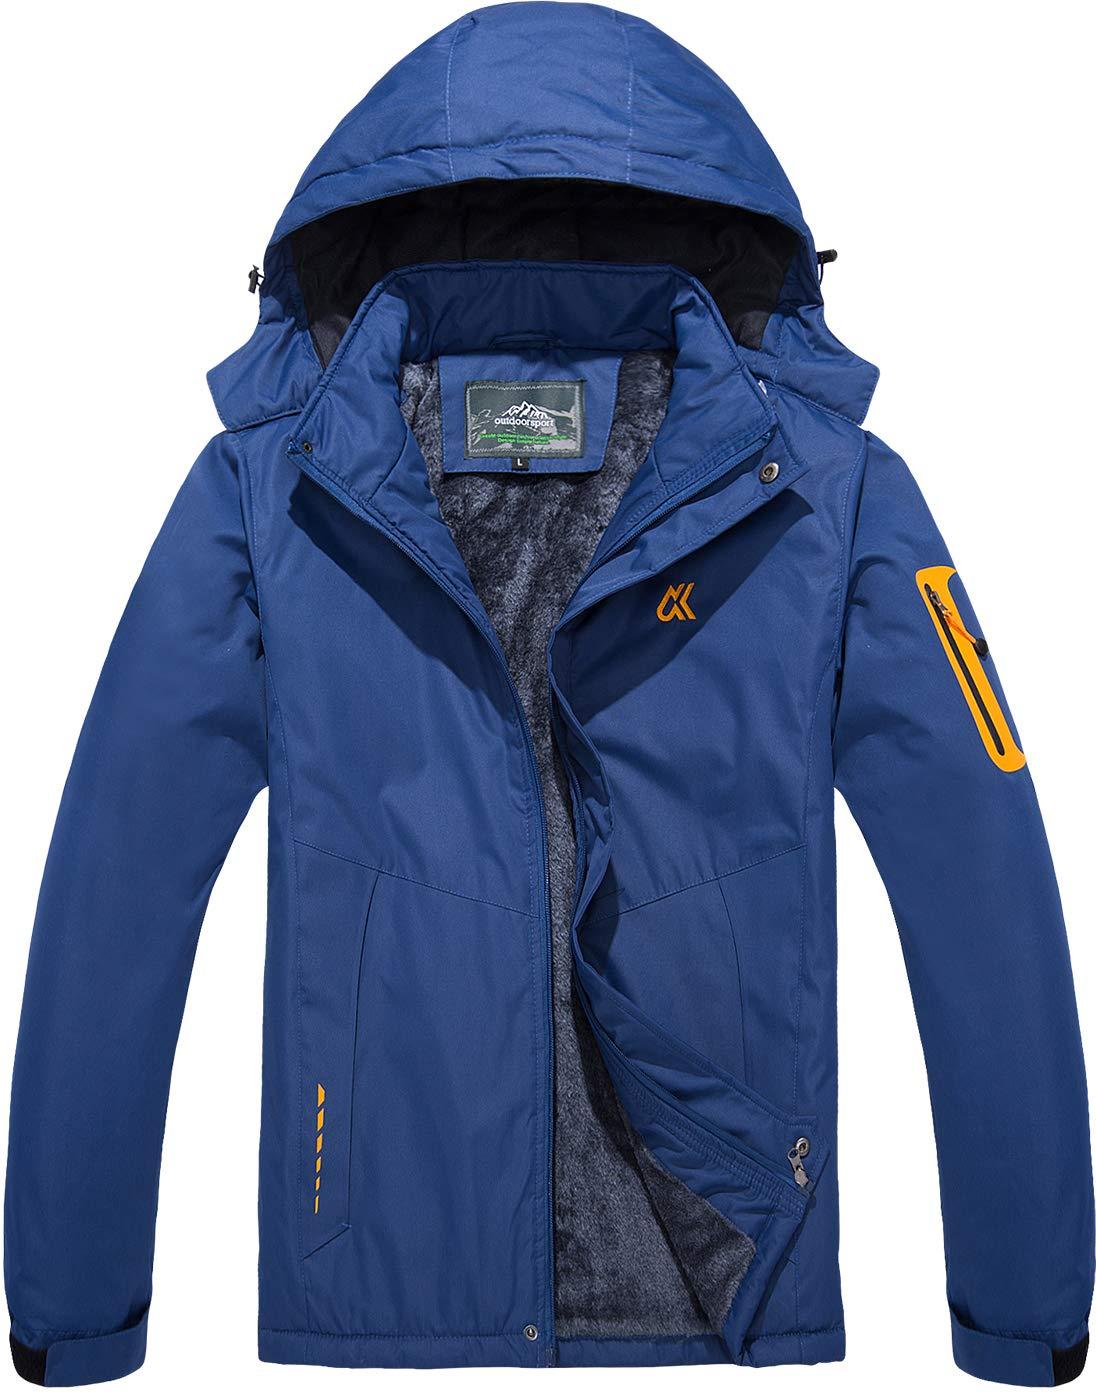 TACVASEN Herren Winterjacke Warme Fleece-Futter Skijacken Winddichte Outdoor Funktionsjacke Freizeitjacke mit Abnehmbarer Kapuze